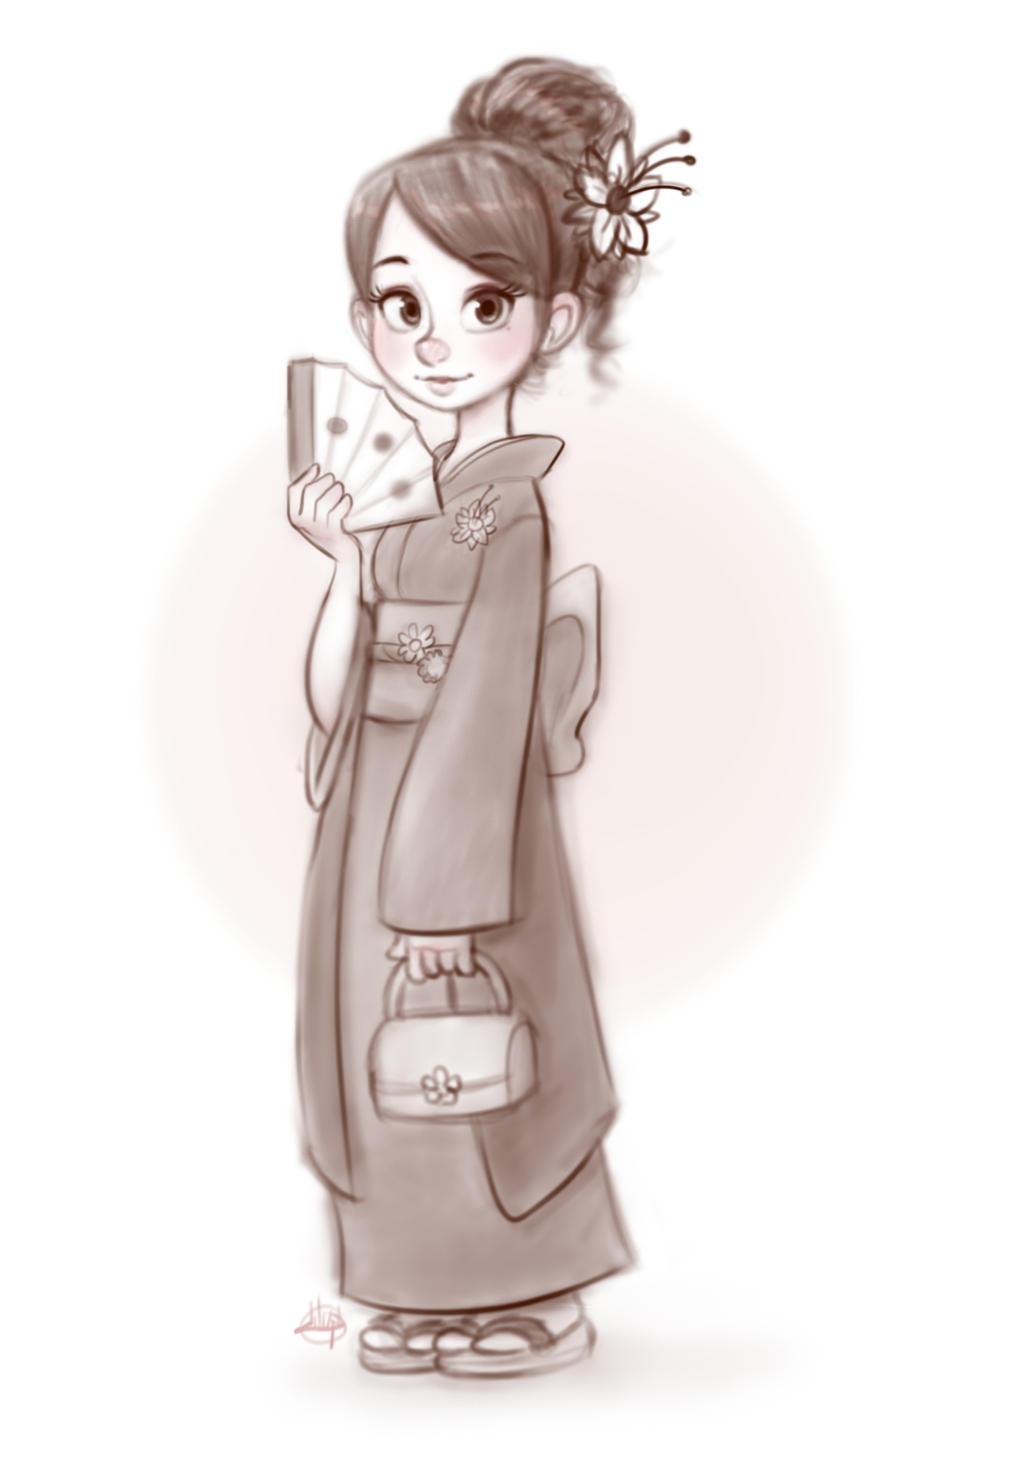 Disney Character Design Artist : Kimono girl by luigil on deviantart